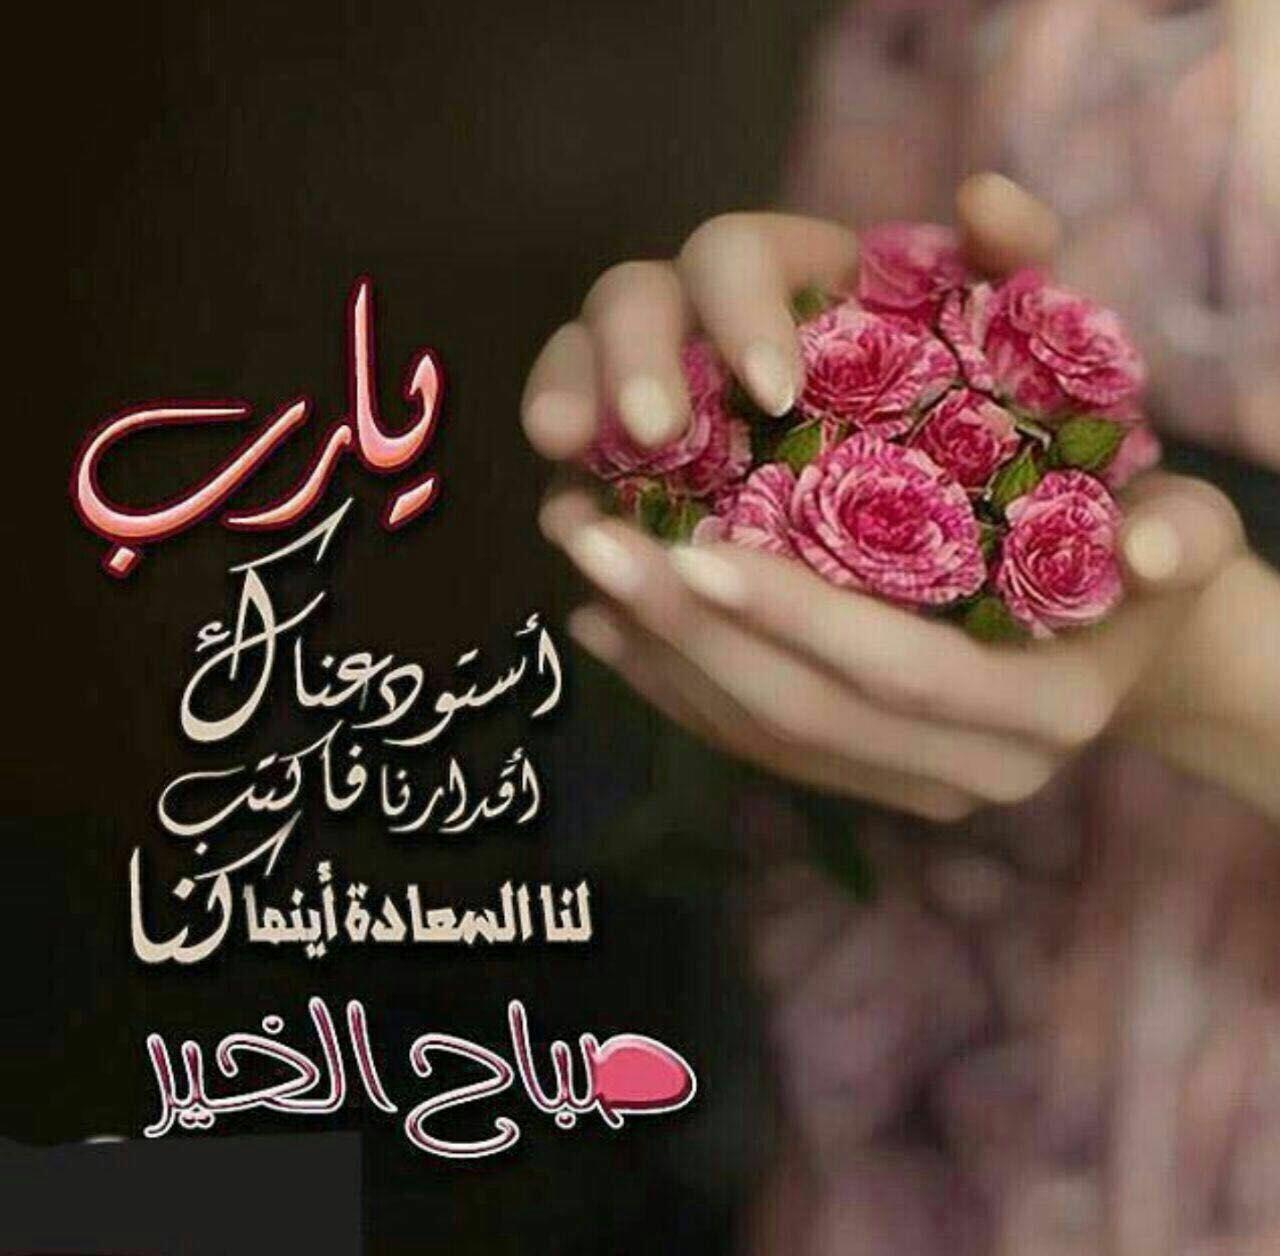 Good Morning صباح الخير Morning Greeting Good Morning Wishes Morning Texts